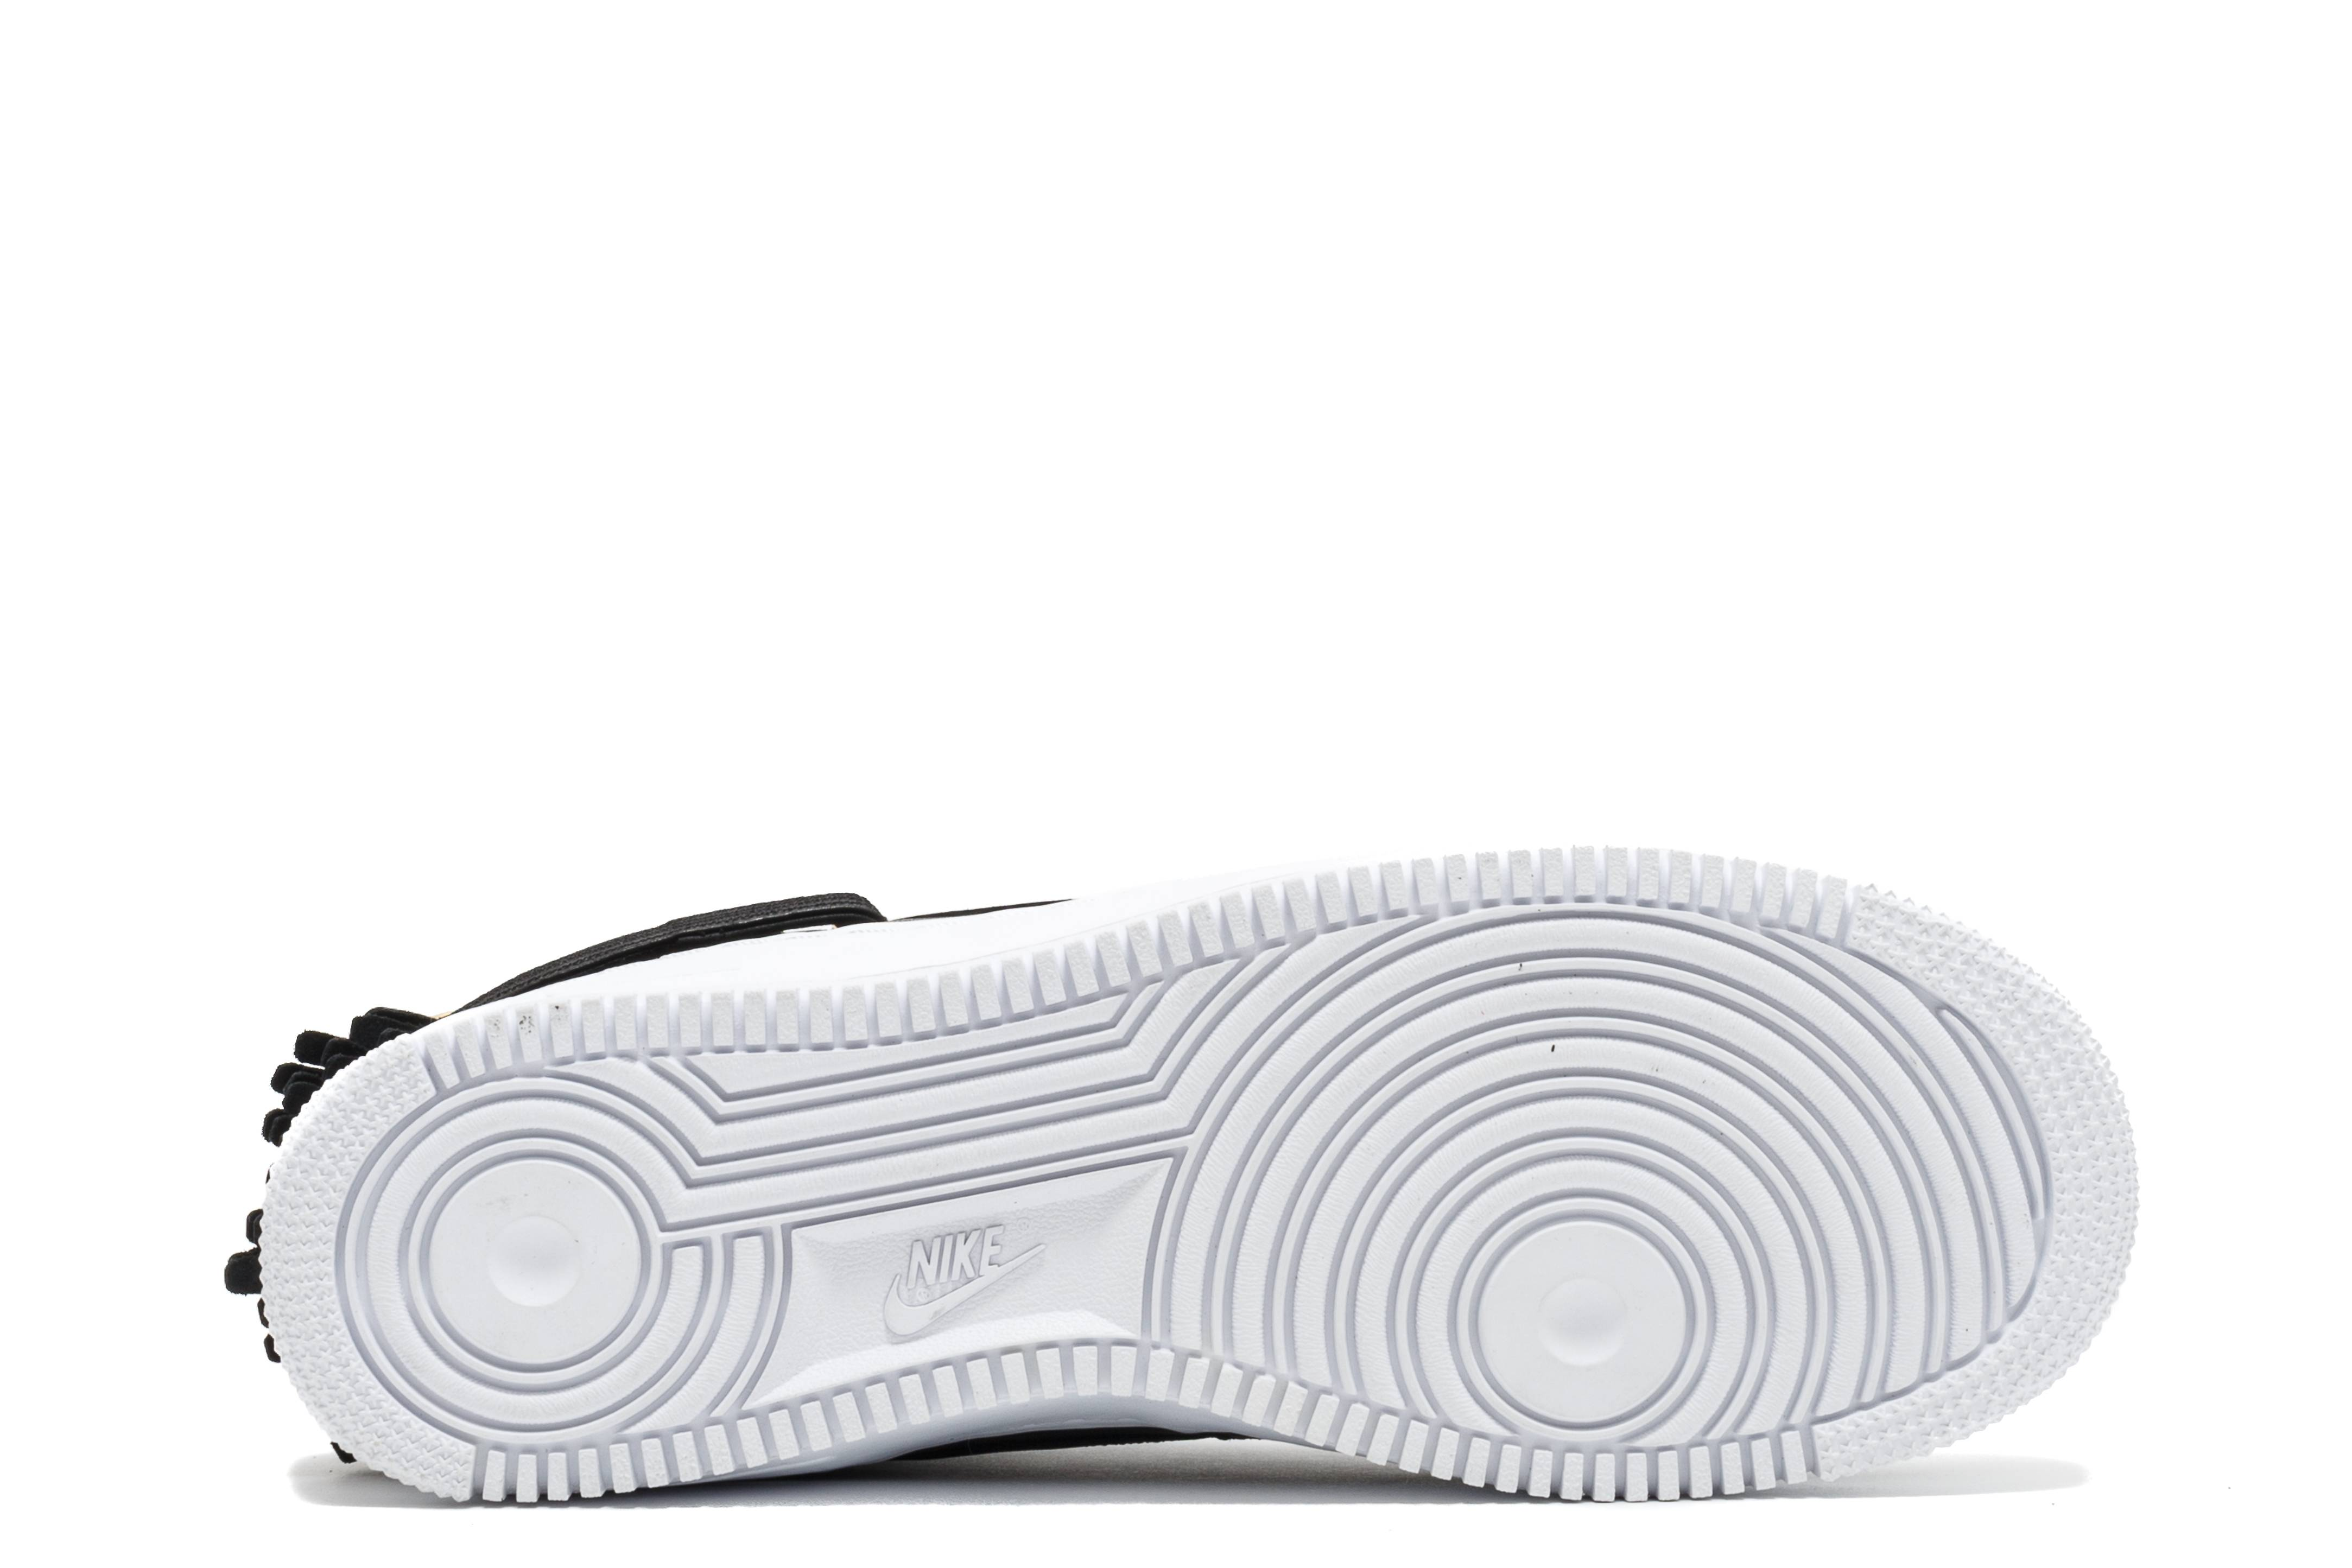 6a4a993e338f Nike Air Force 1 Cmft Lux High White Black 857667-735744 ...